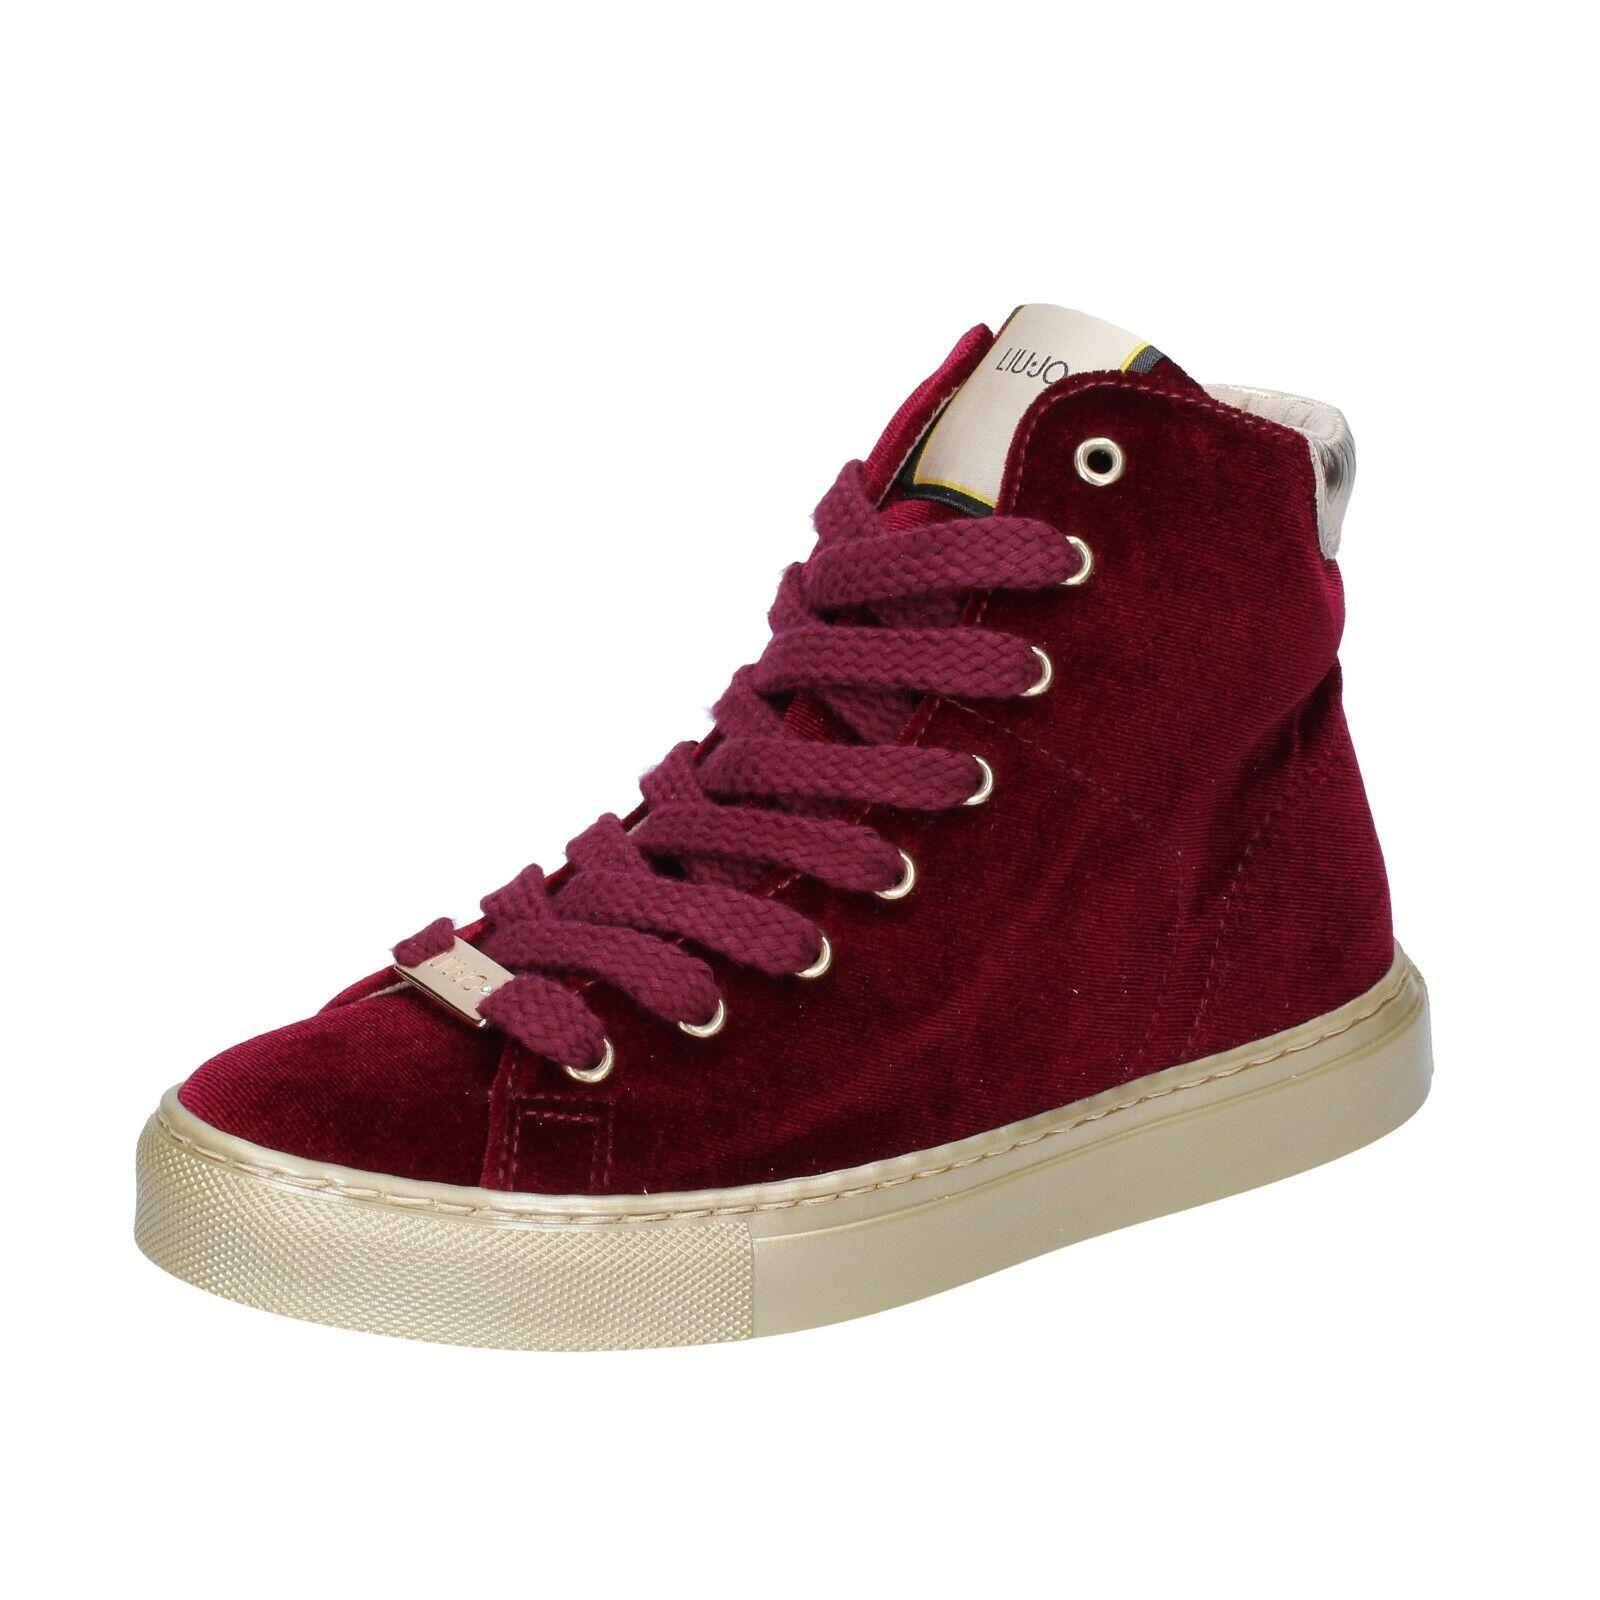 Chaussures femmes LIU JO 38 UE Baskets Bourgogne velours bs658-38